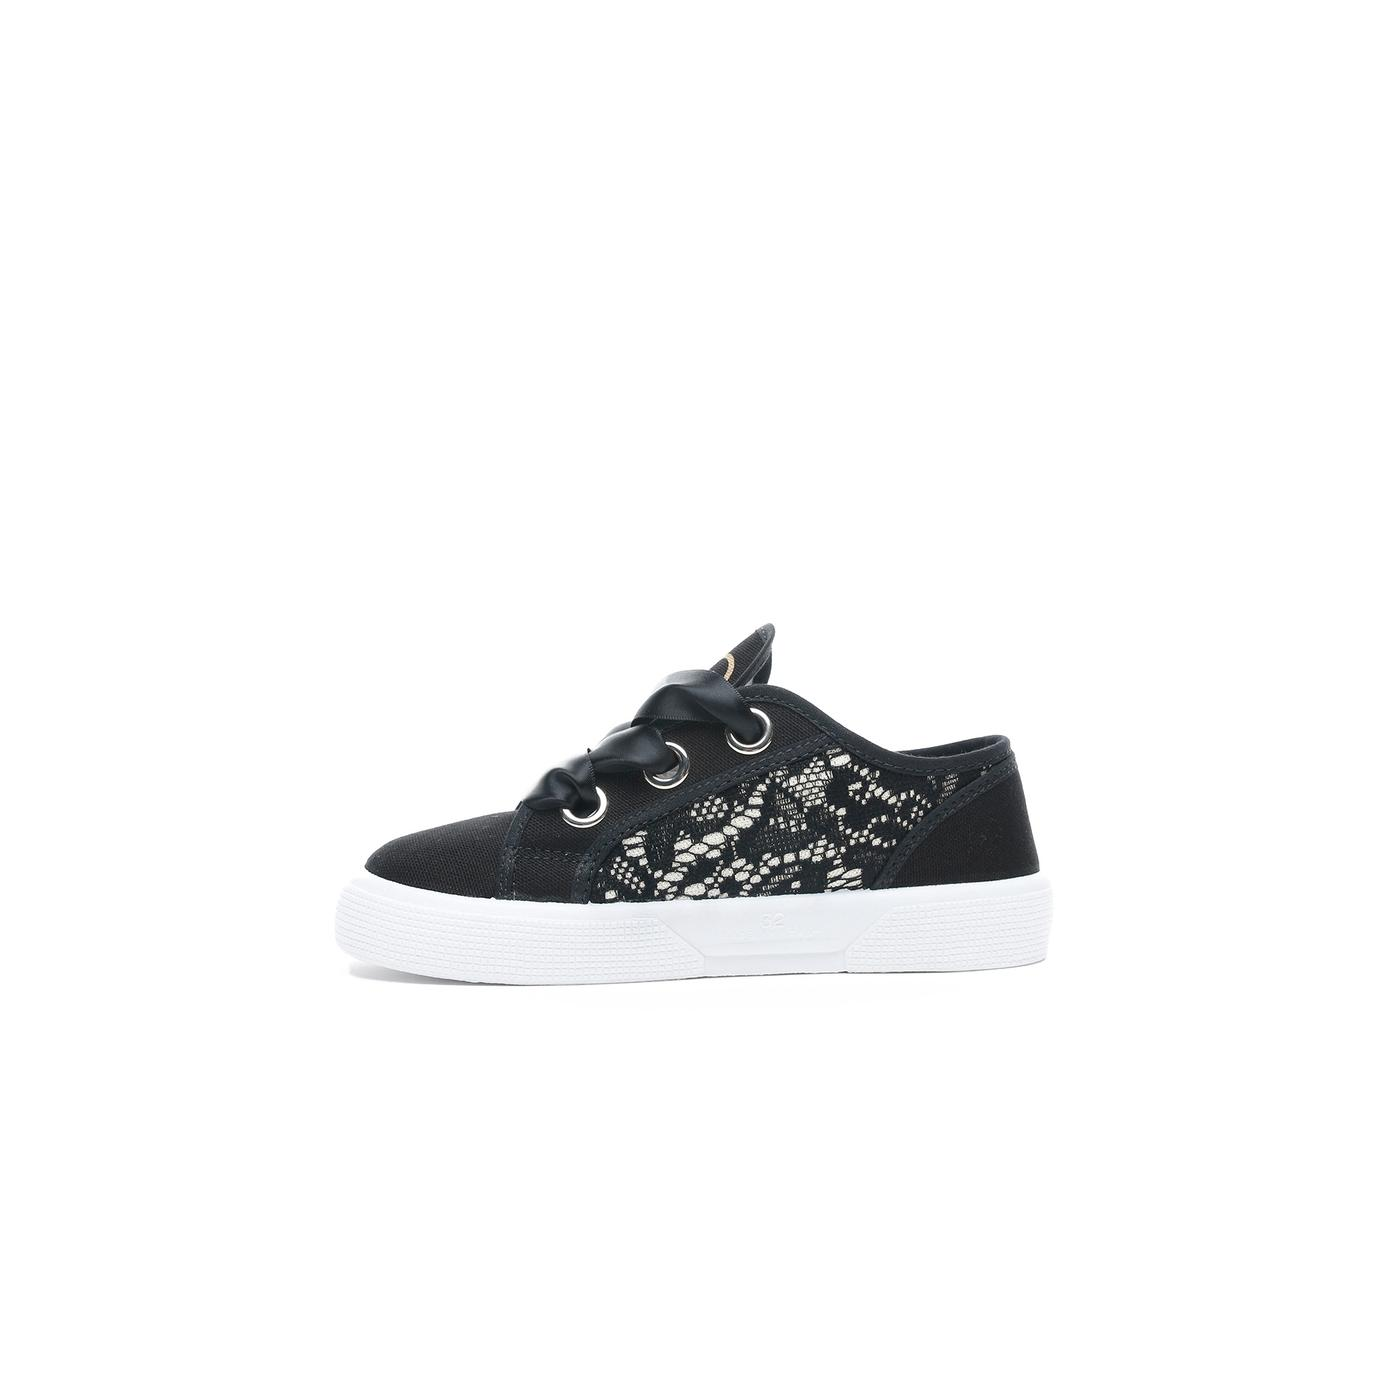 Guess Piuma Lace Çocuk Siyah Günlük Ayakkabı